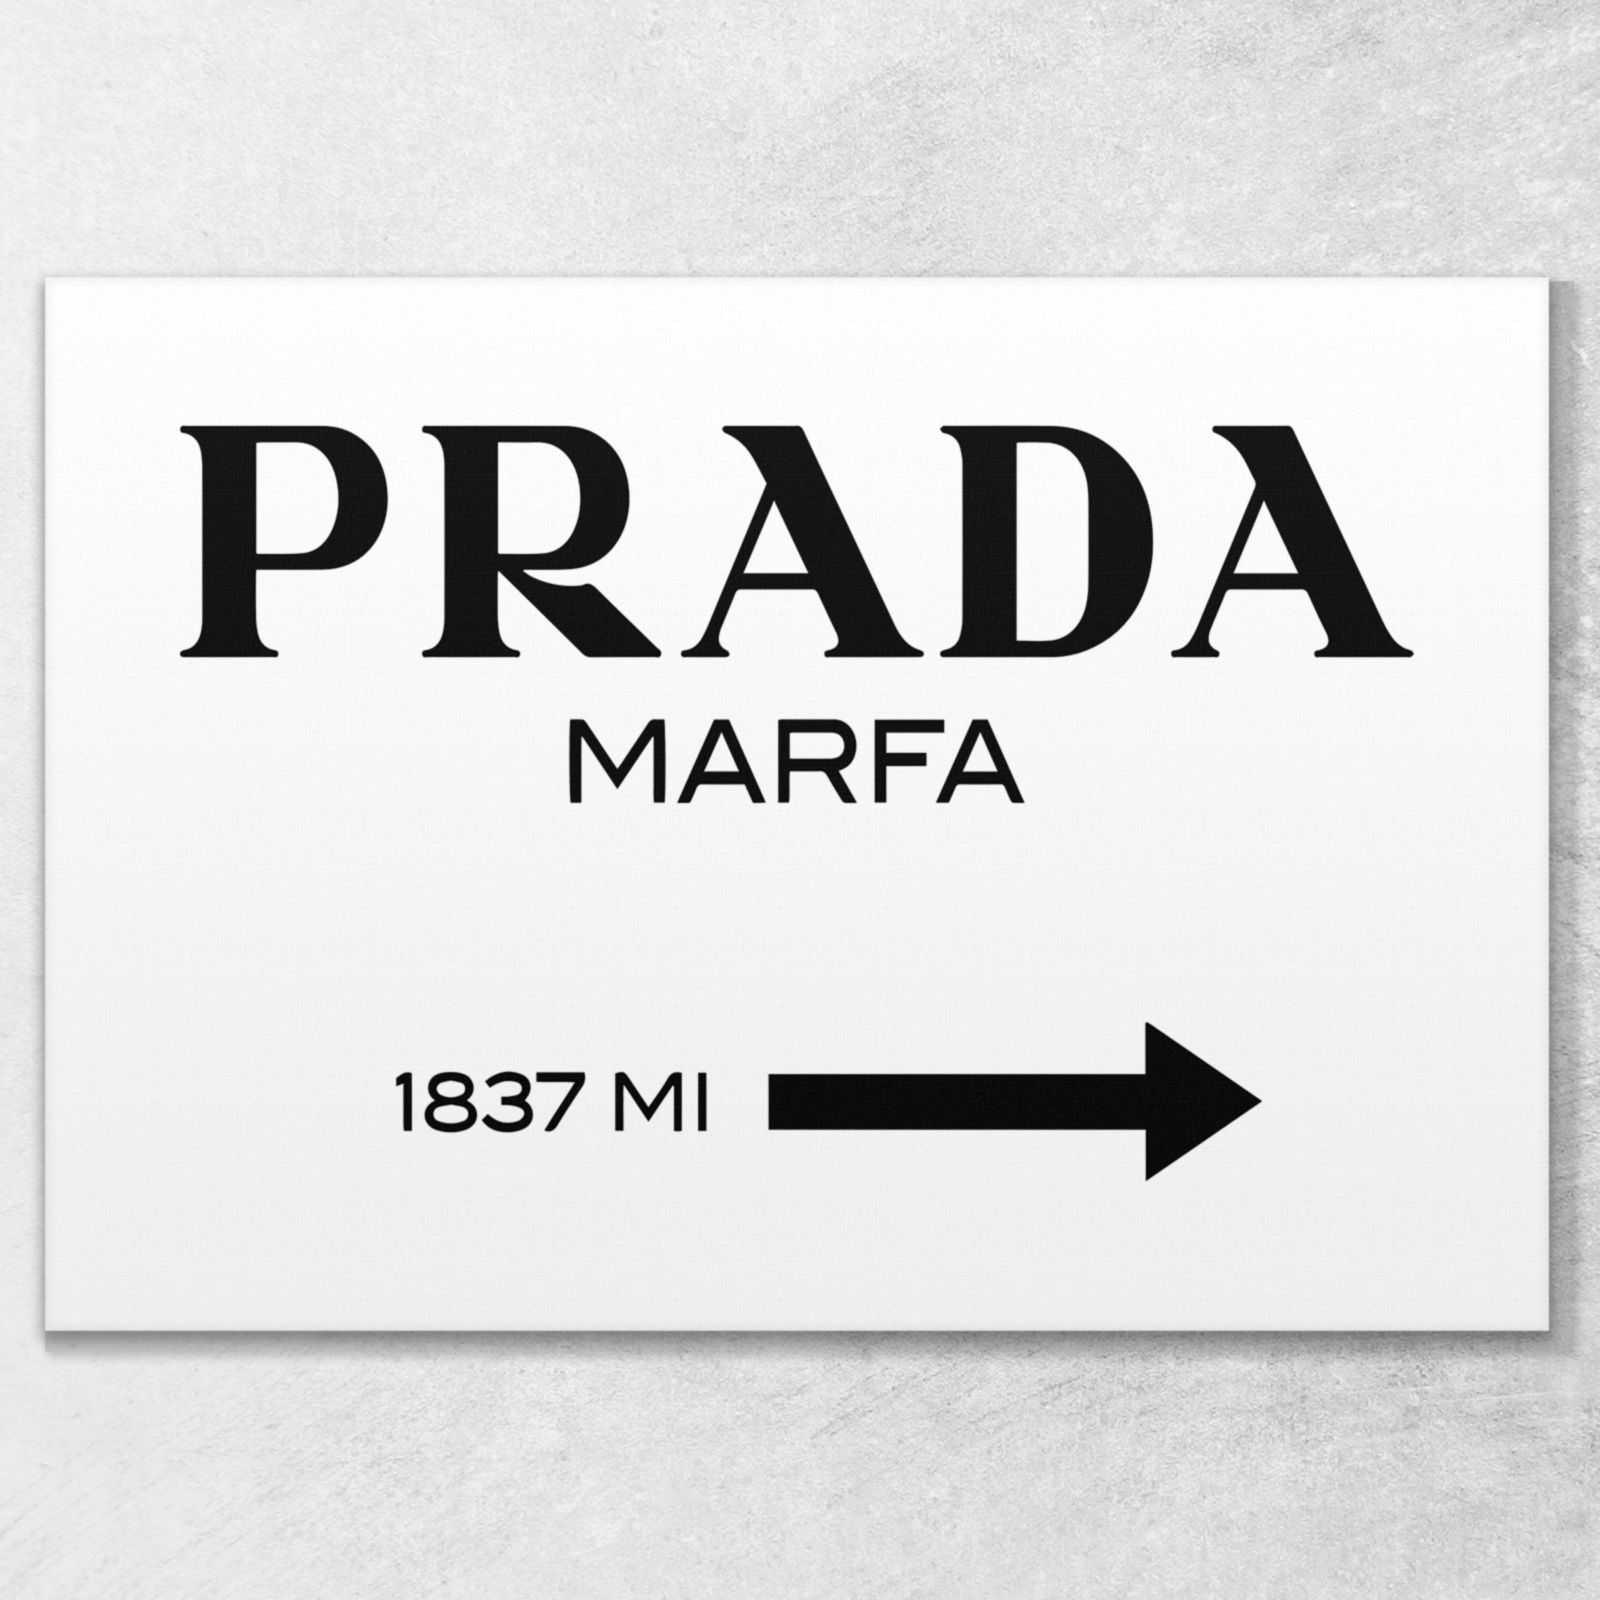 ❤️ Quadro Prada Marfa Gossip girl quadro moderno 70x50 cm stampa su tela